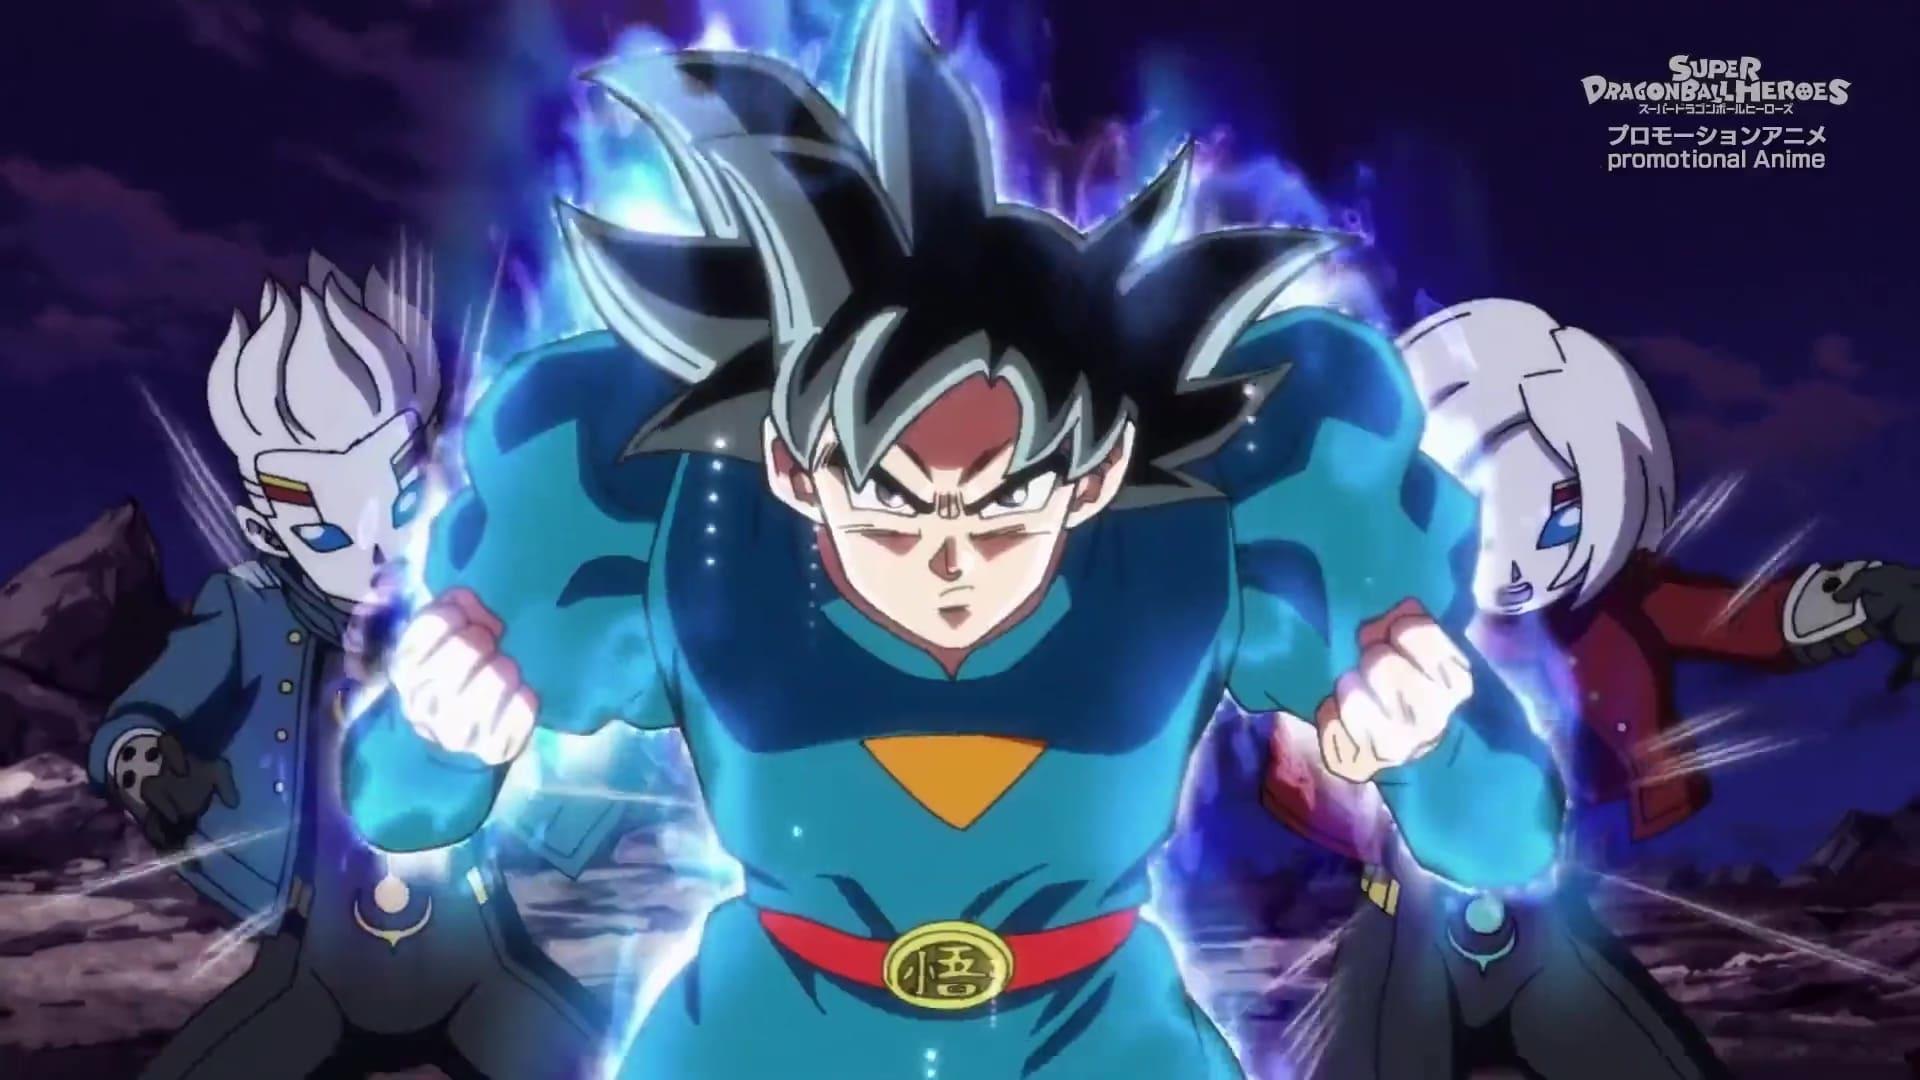 Goku Ssj Wallpaper Hd Streaming Super Dragon Ball Heroes S1 Ep 10 Sub Indo